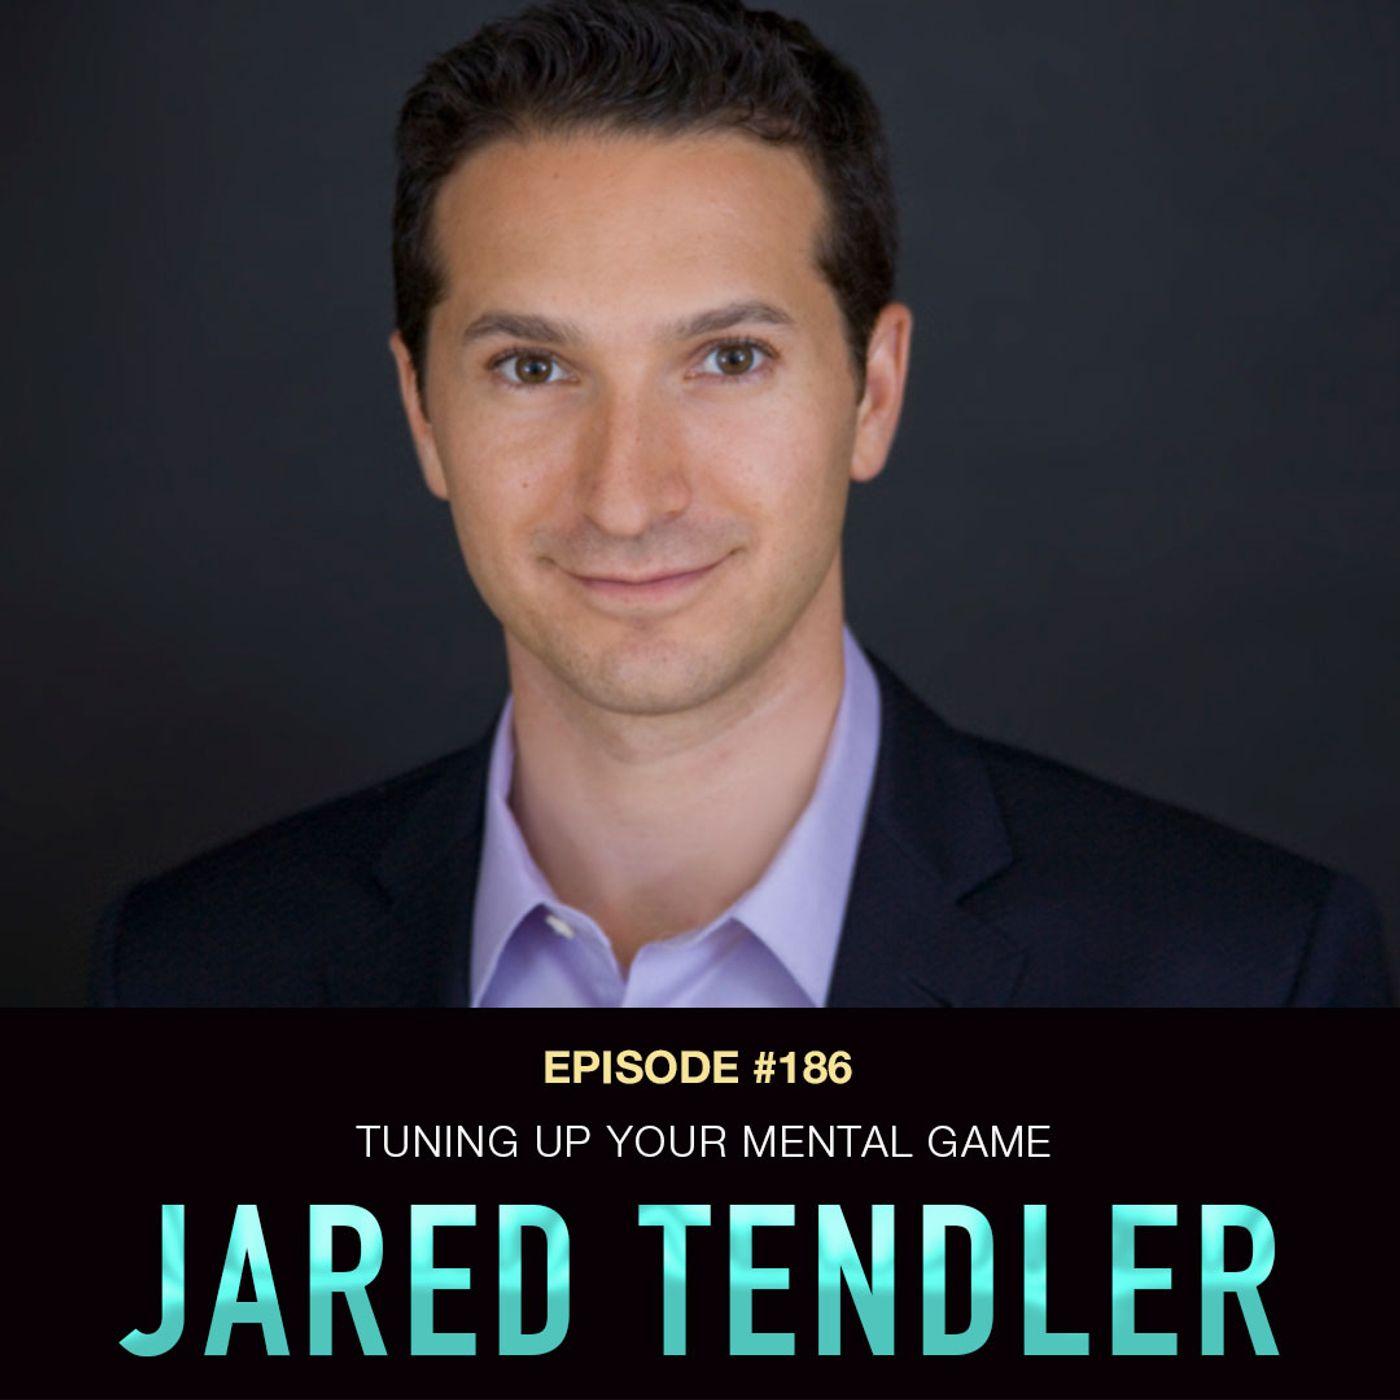 #186 Jared Tendler: Tuning Up Your Mental Game